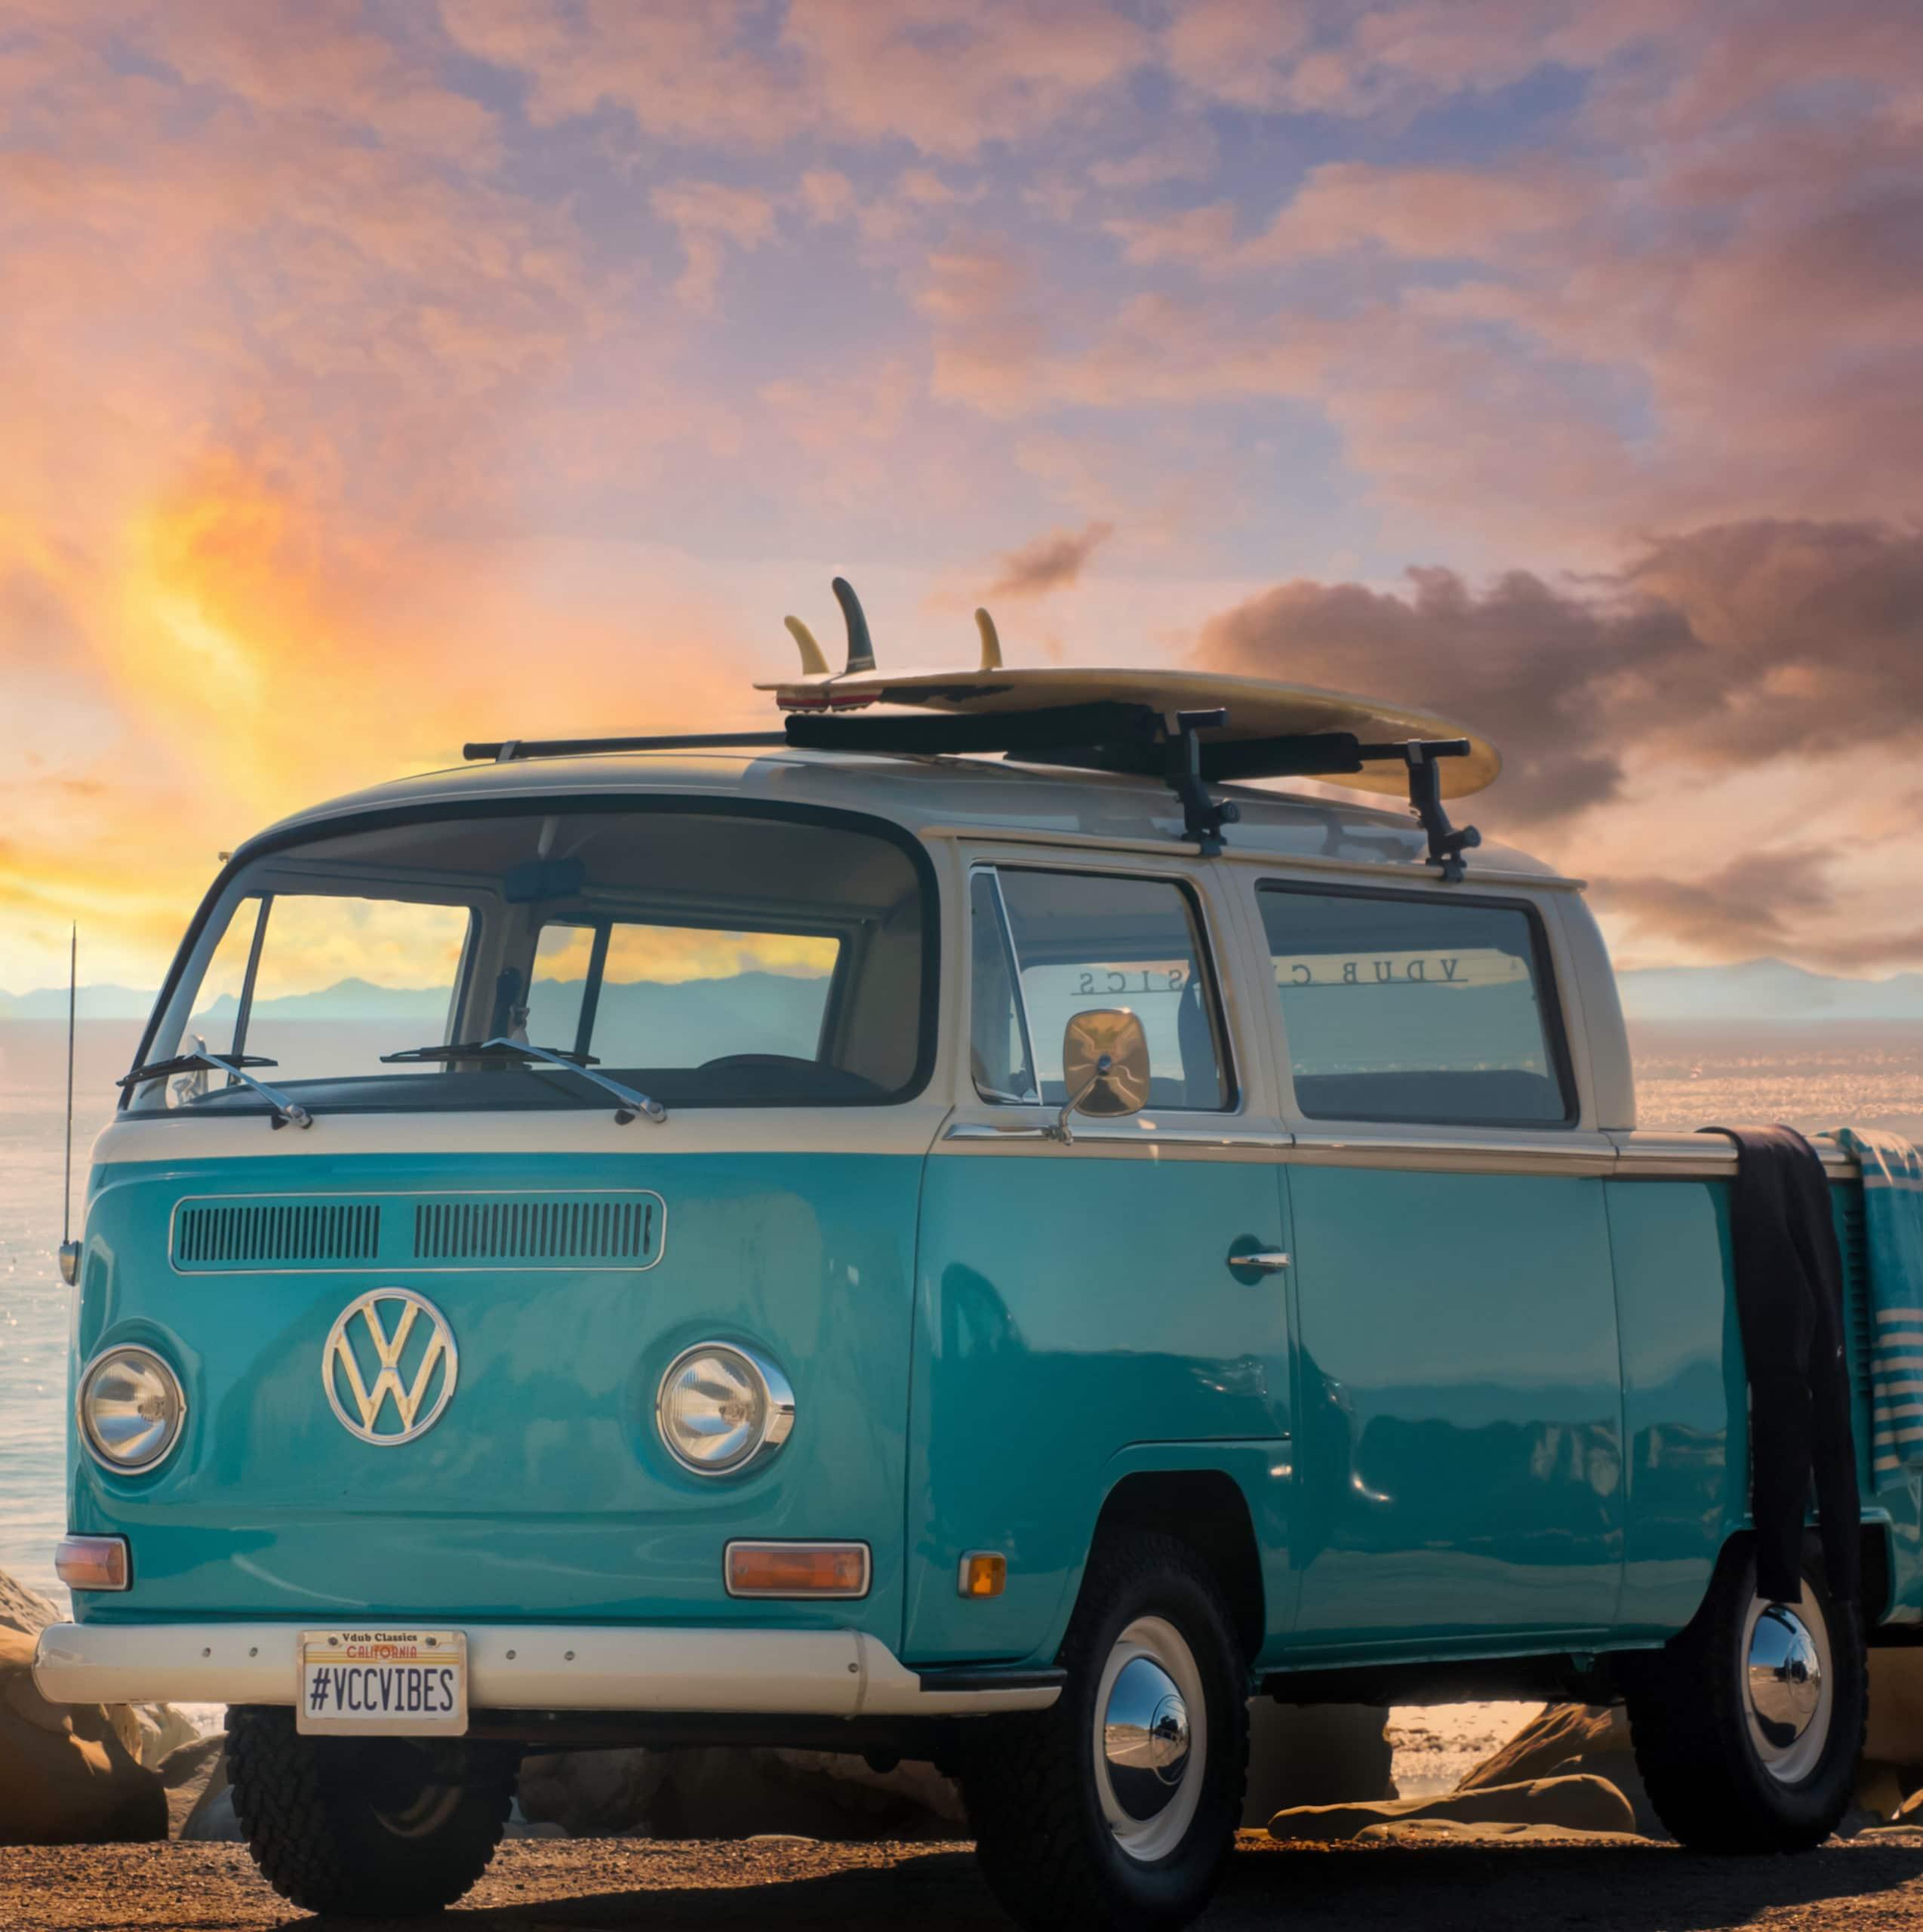 Ventura_Beach_VW Bus_Landscape (1)